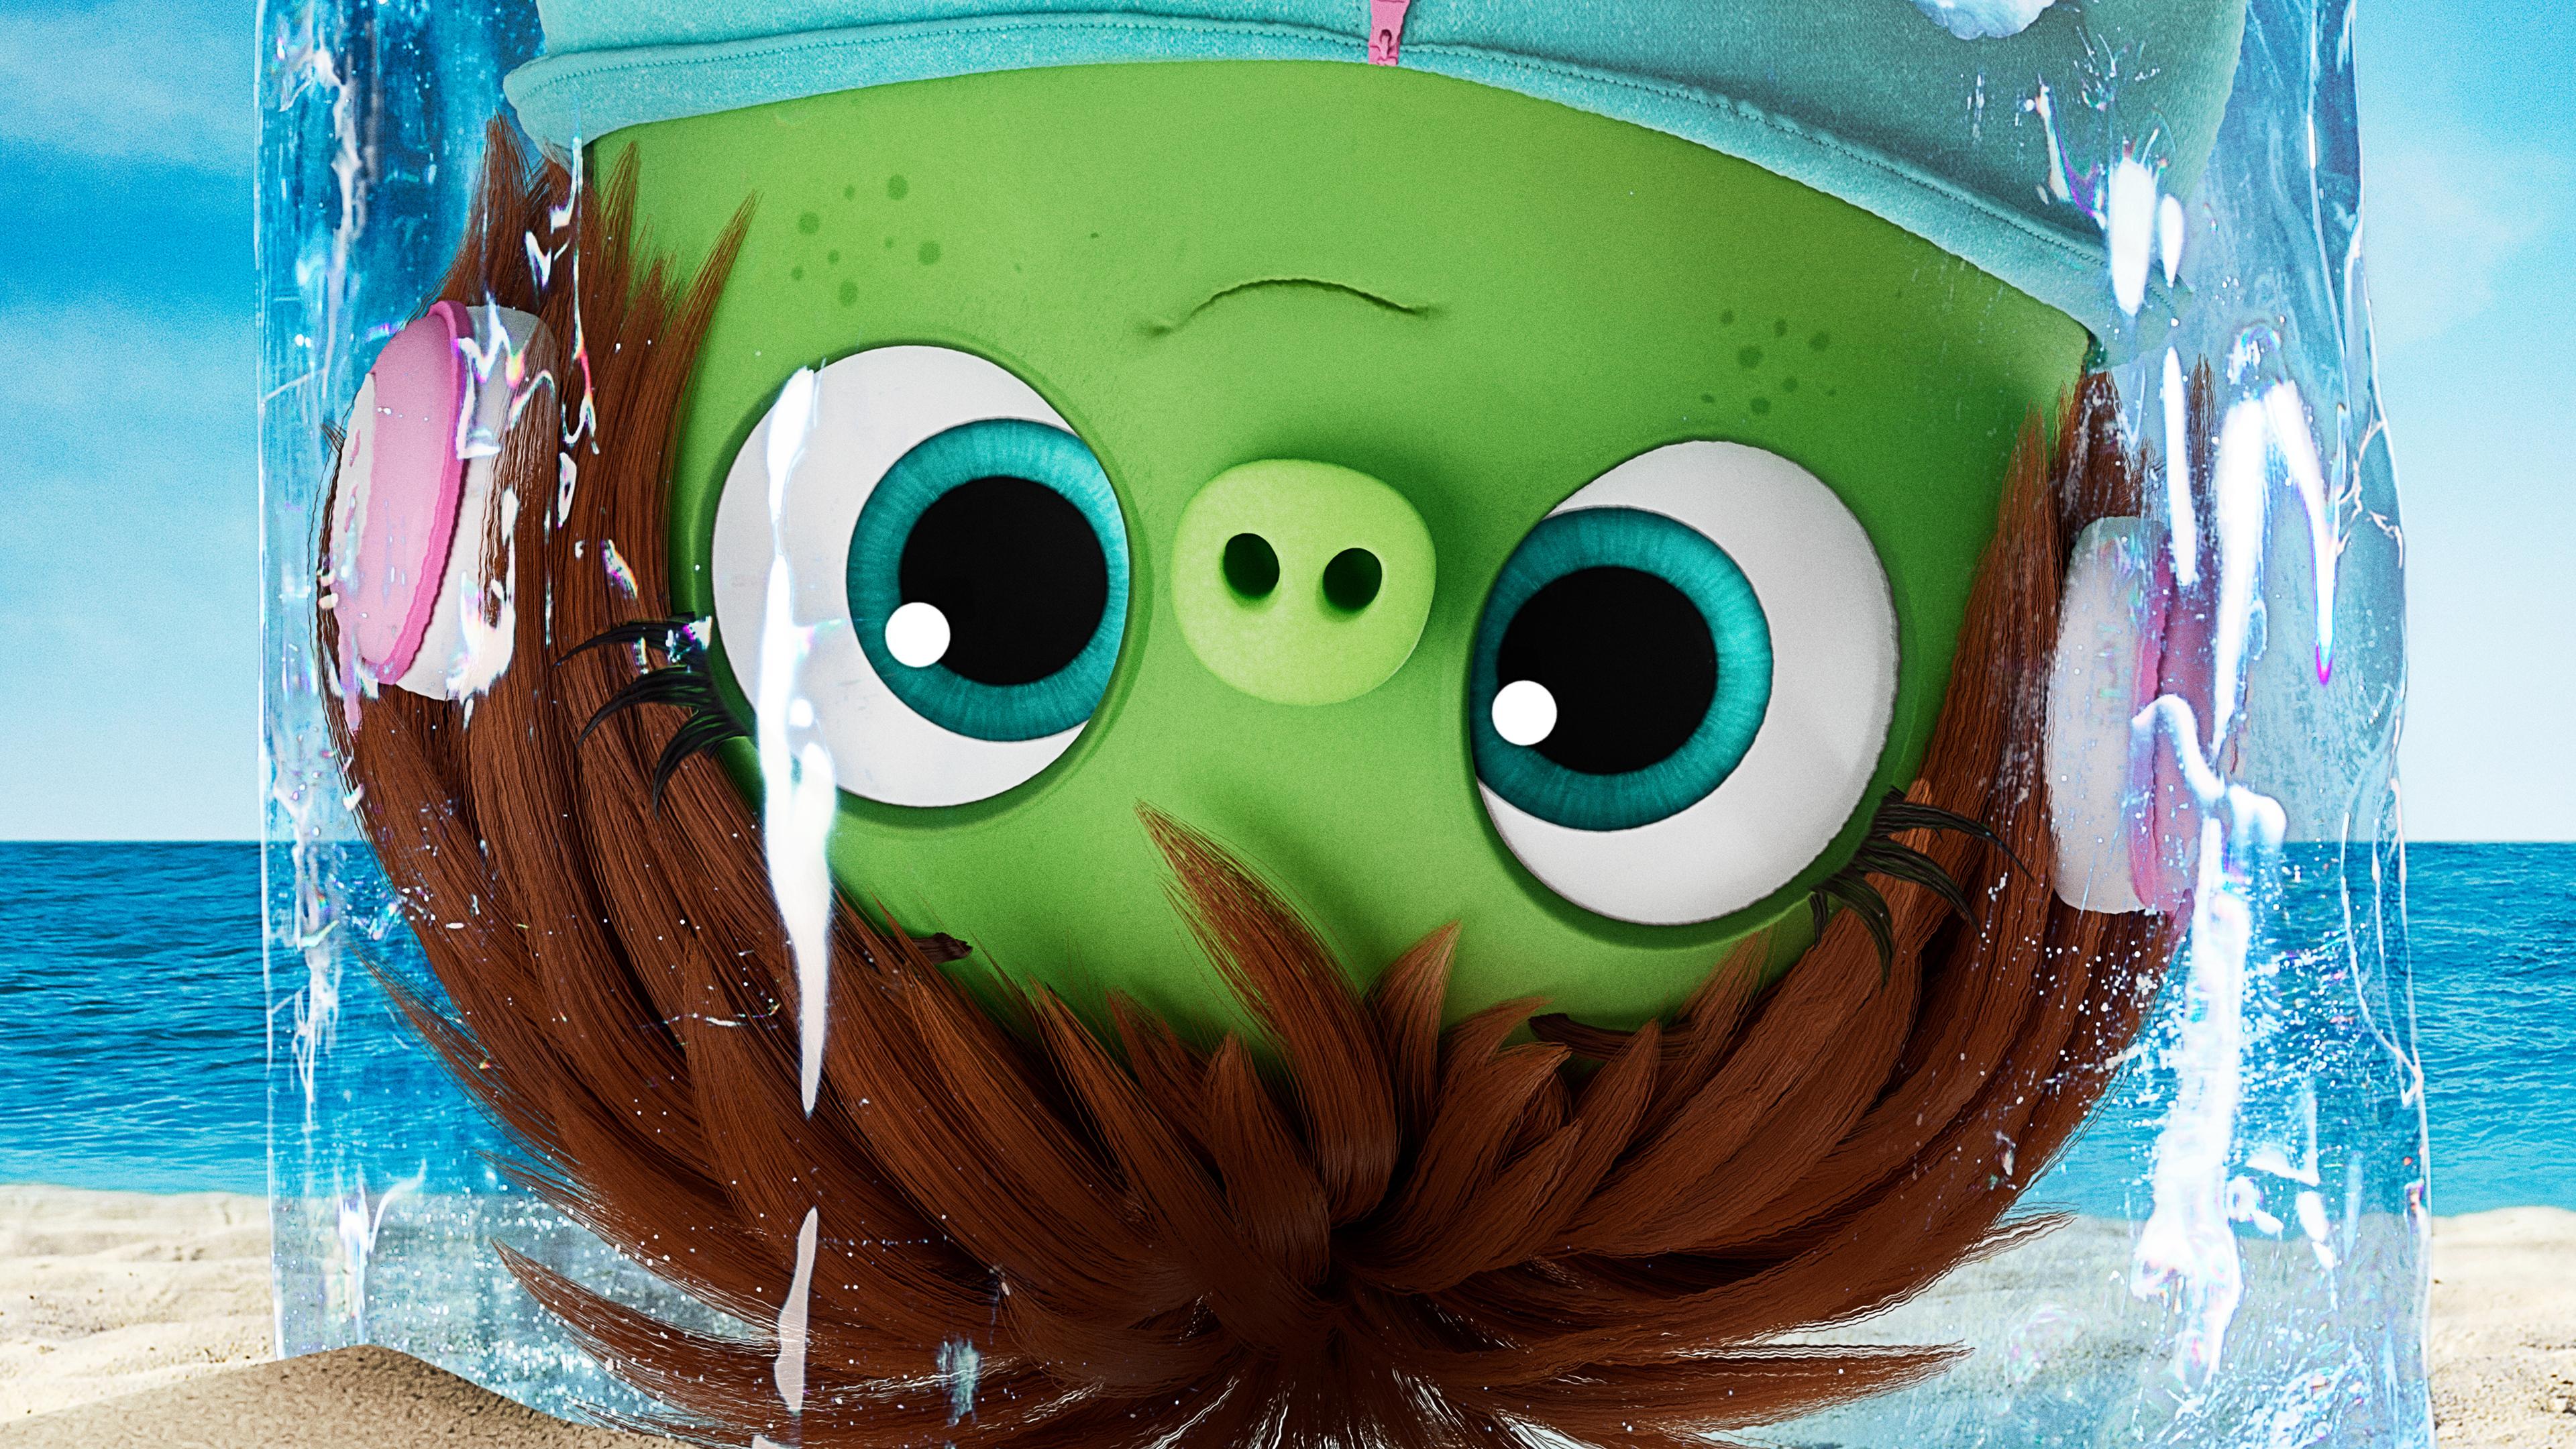 2019 the angry birds movie 2 4k 1560535021 - 2019 The Angry Birds Movie 2 4k - the angry birds movie 2 wallpapers, the angry birds 2 wallpapers, movies wallpapers, hd-wallpapers, angry birds wallpapers, 4k-wallpapers, 2019 movies wallpapers